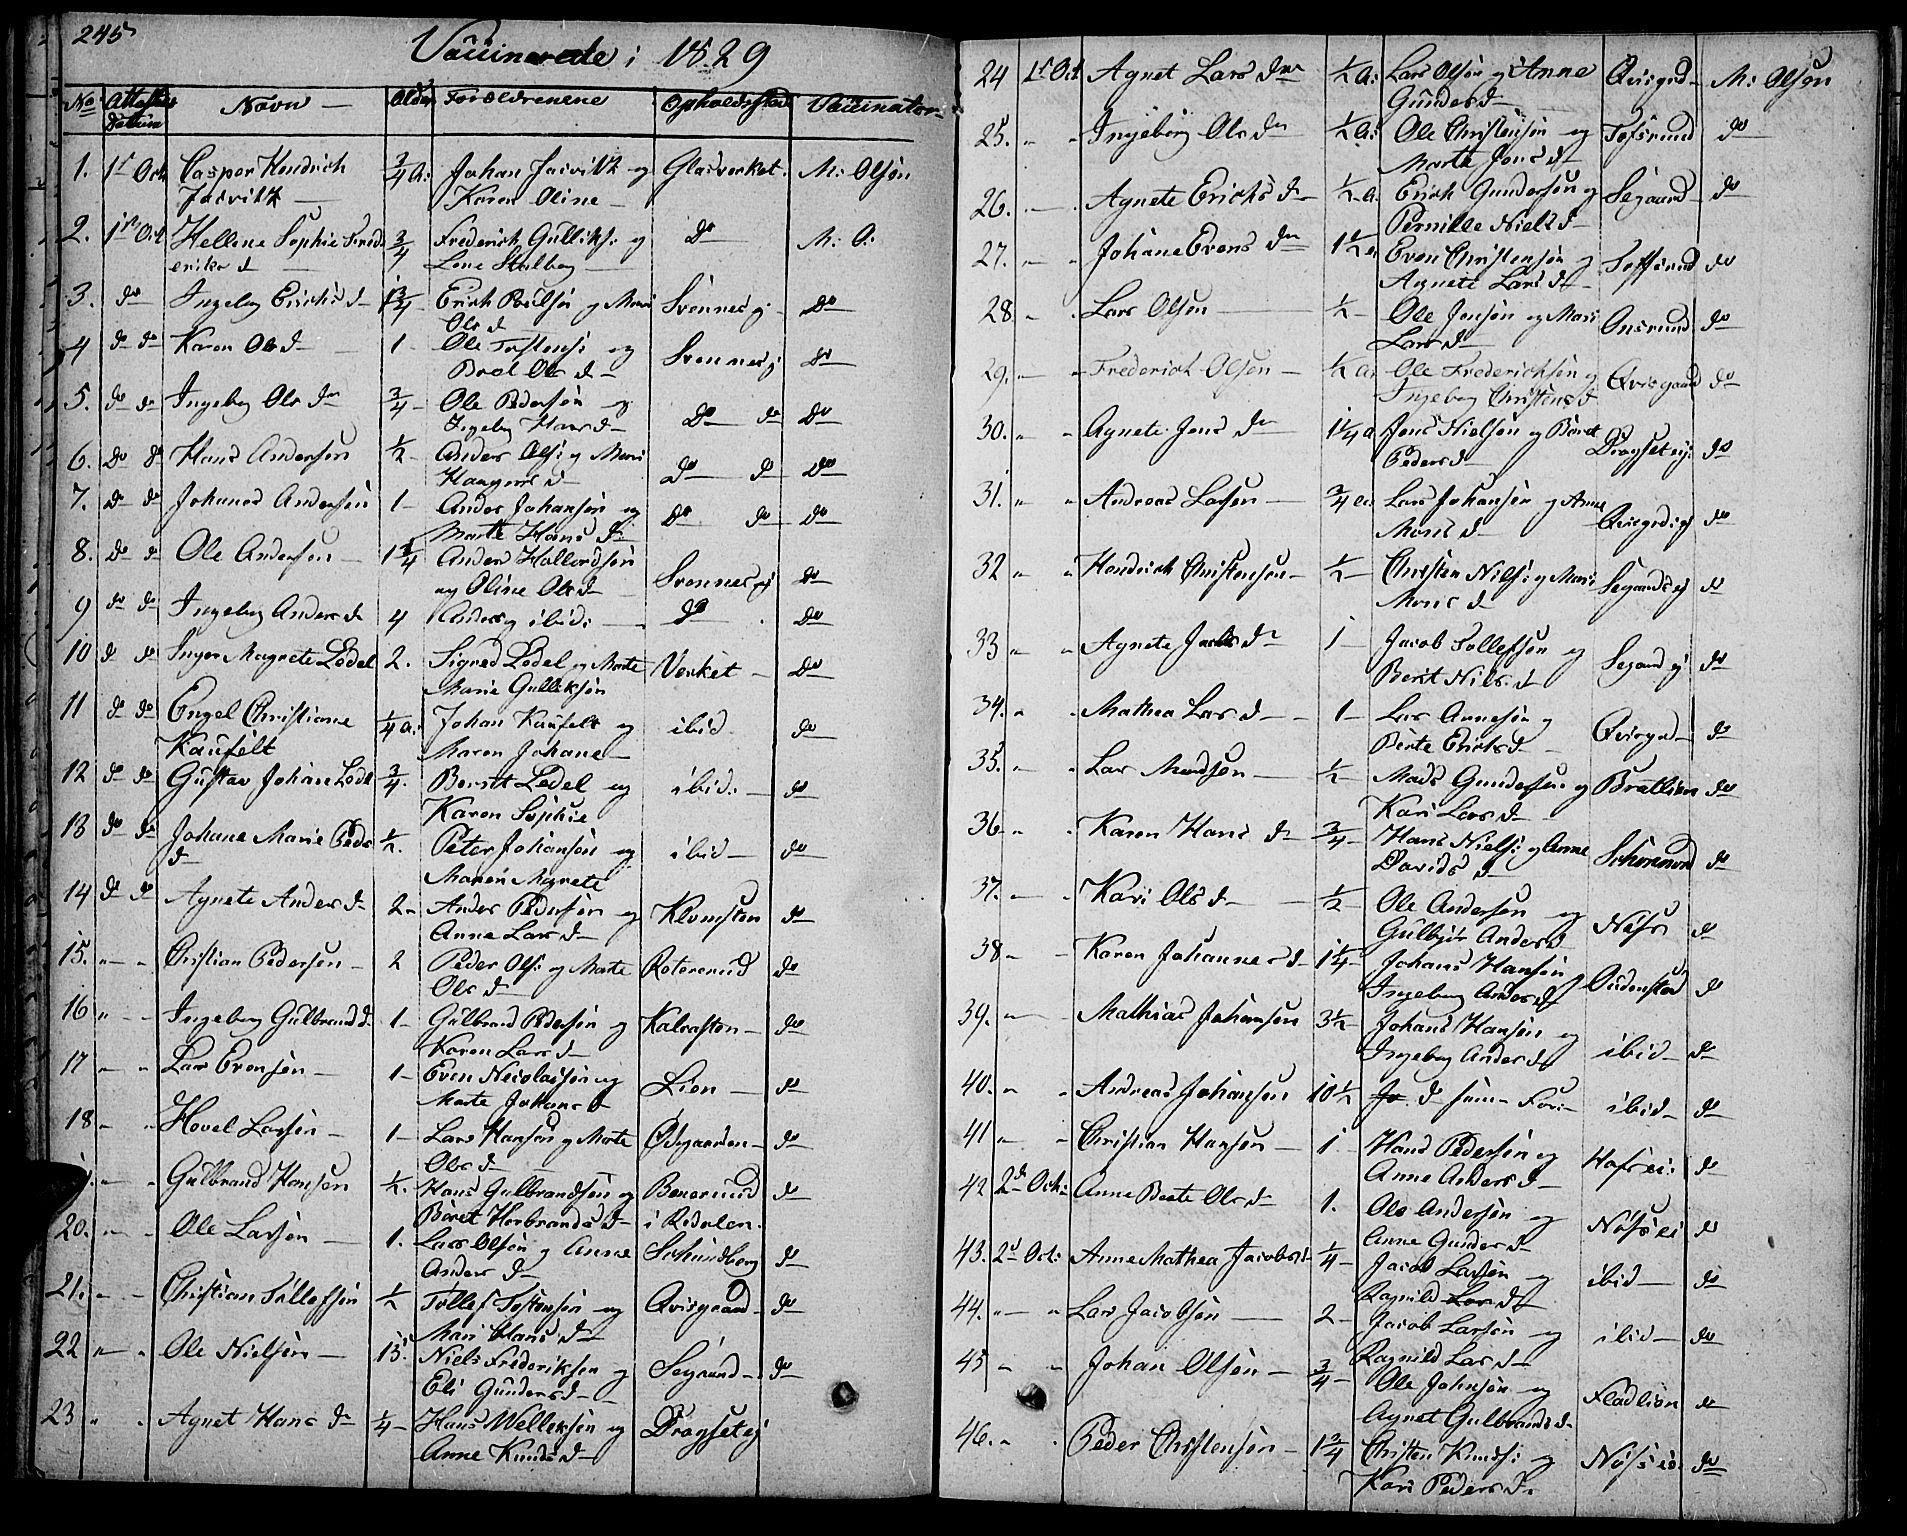 SAH, Biri prestekontor, Ministerialbok nr. 4, 1829-1842, s. 245